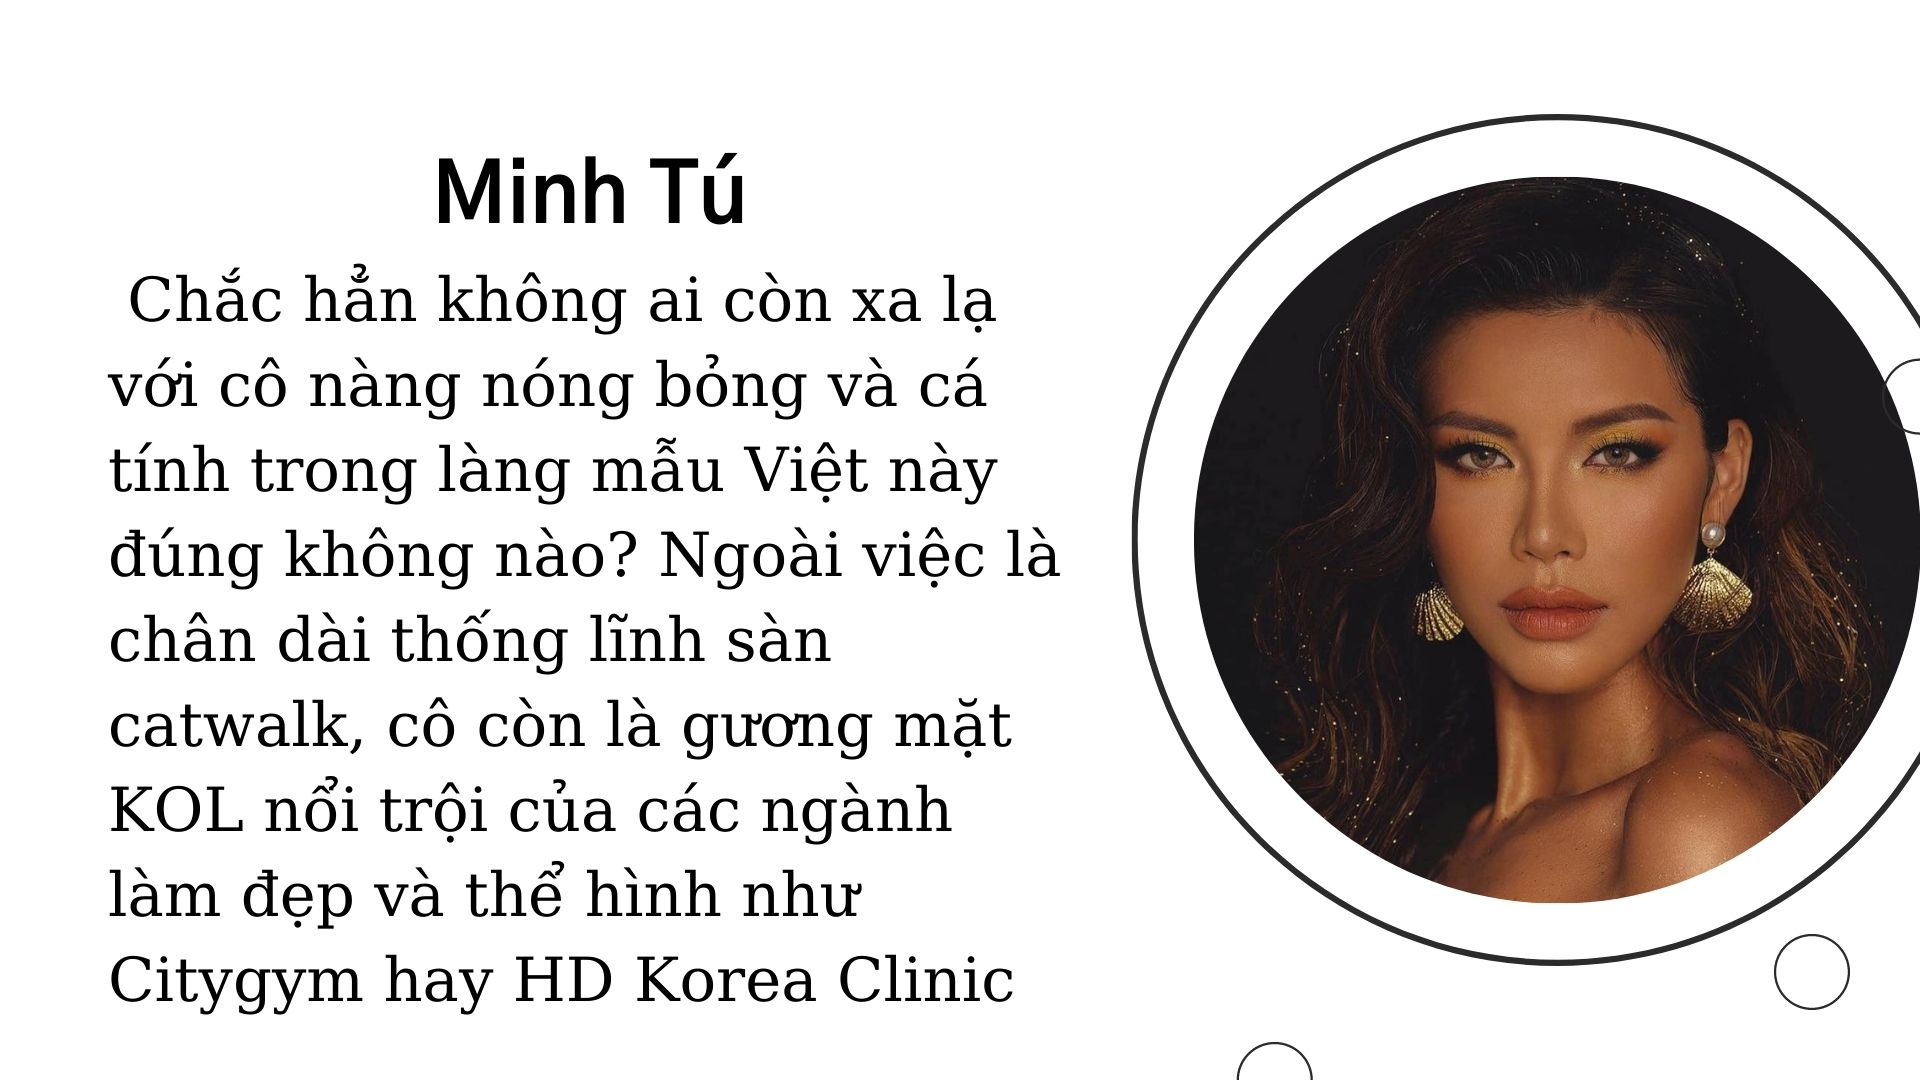 KOL Minh Tú